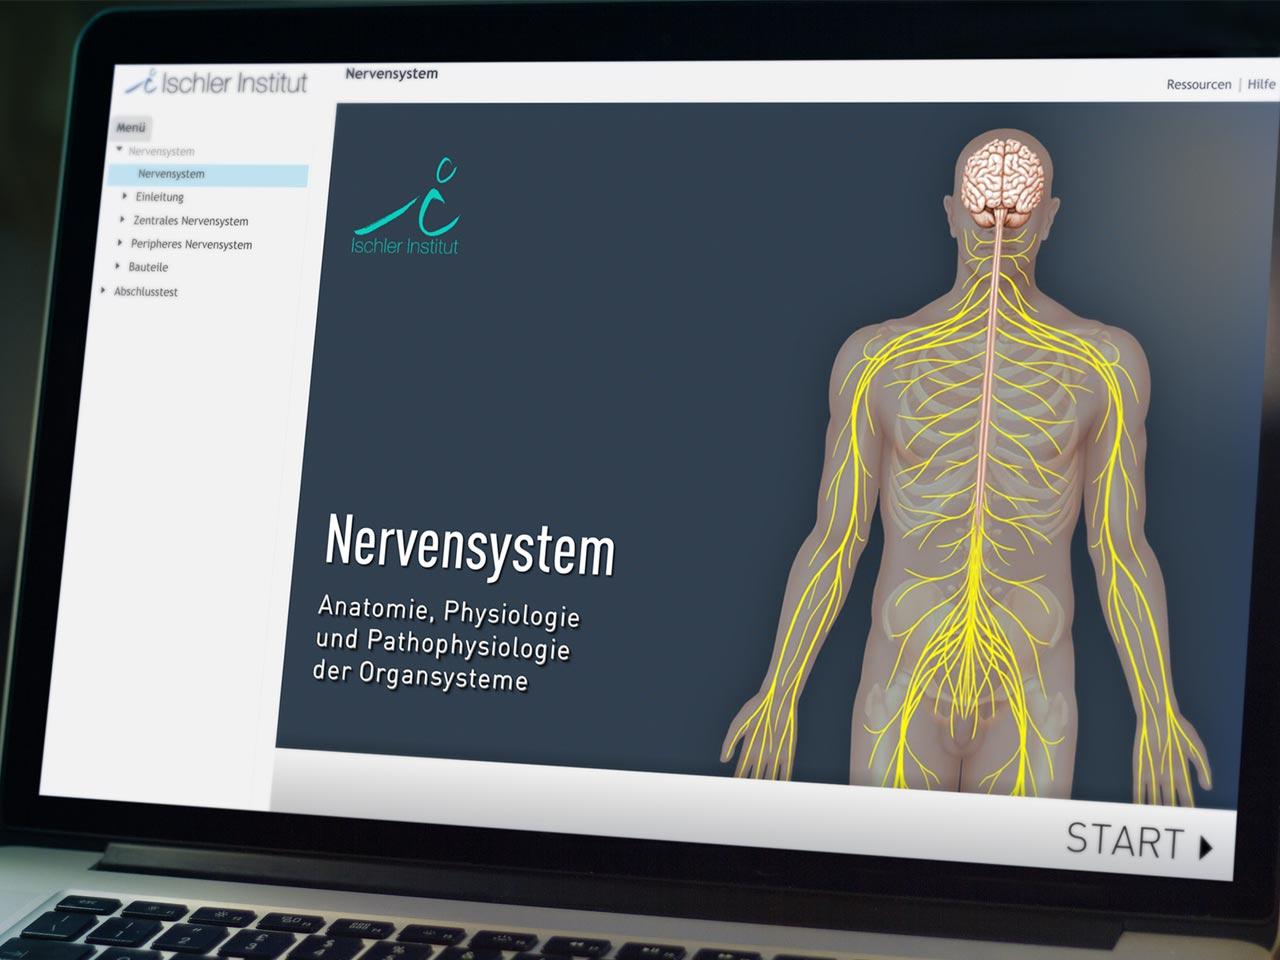 Großzügig Anatomie Und Physiologie Des Nervensystems Pdf Fotos ...